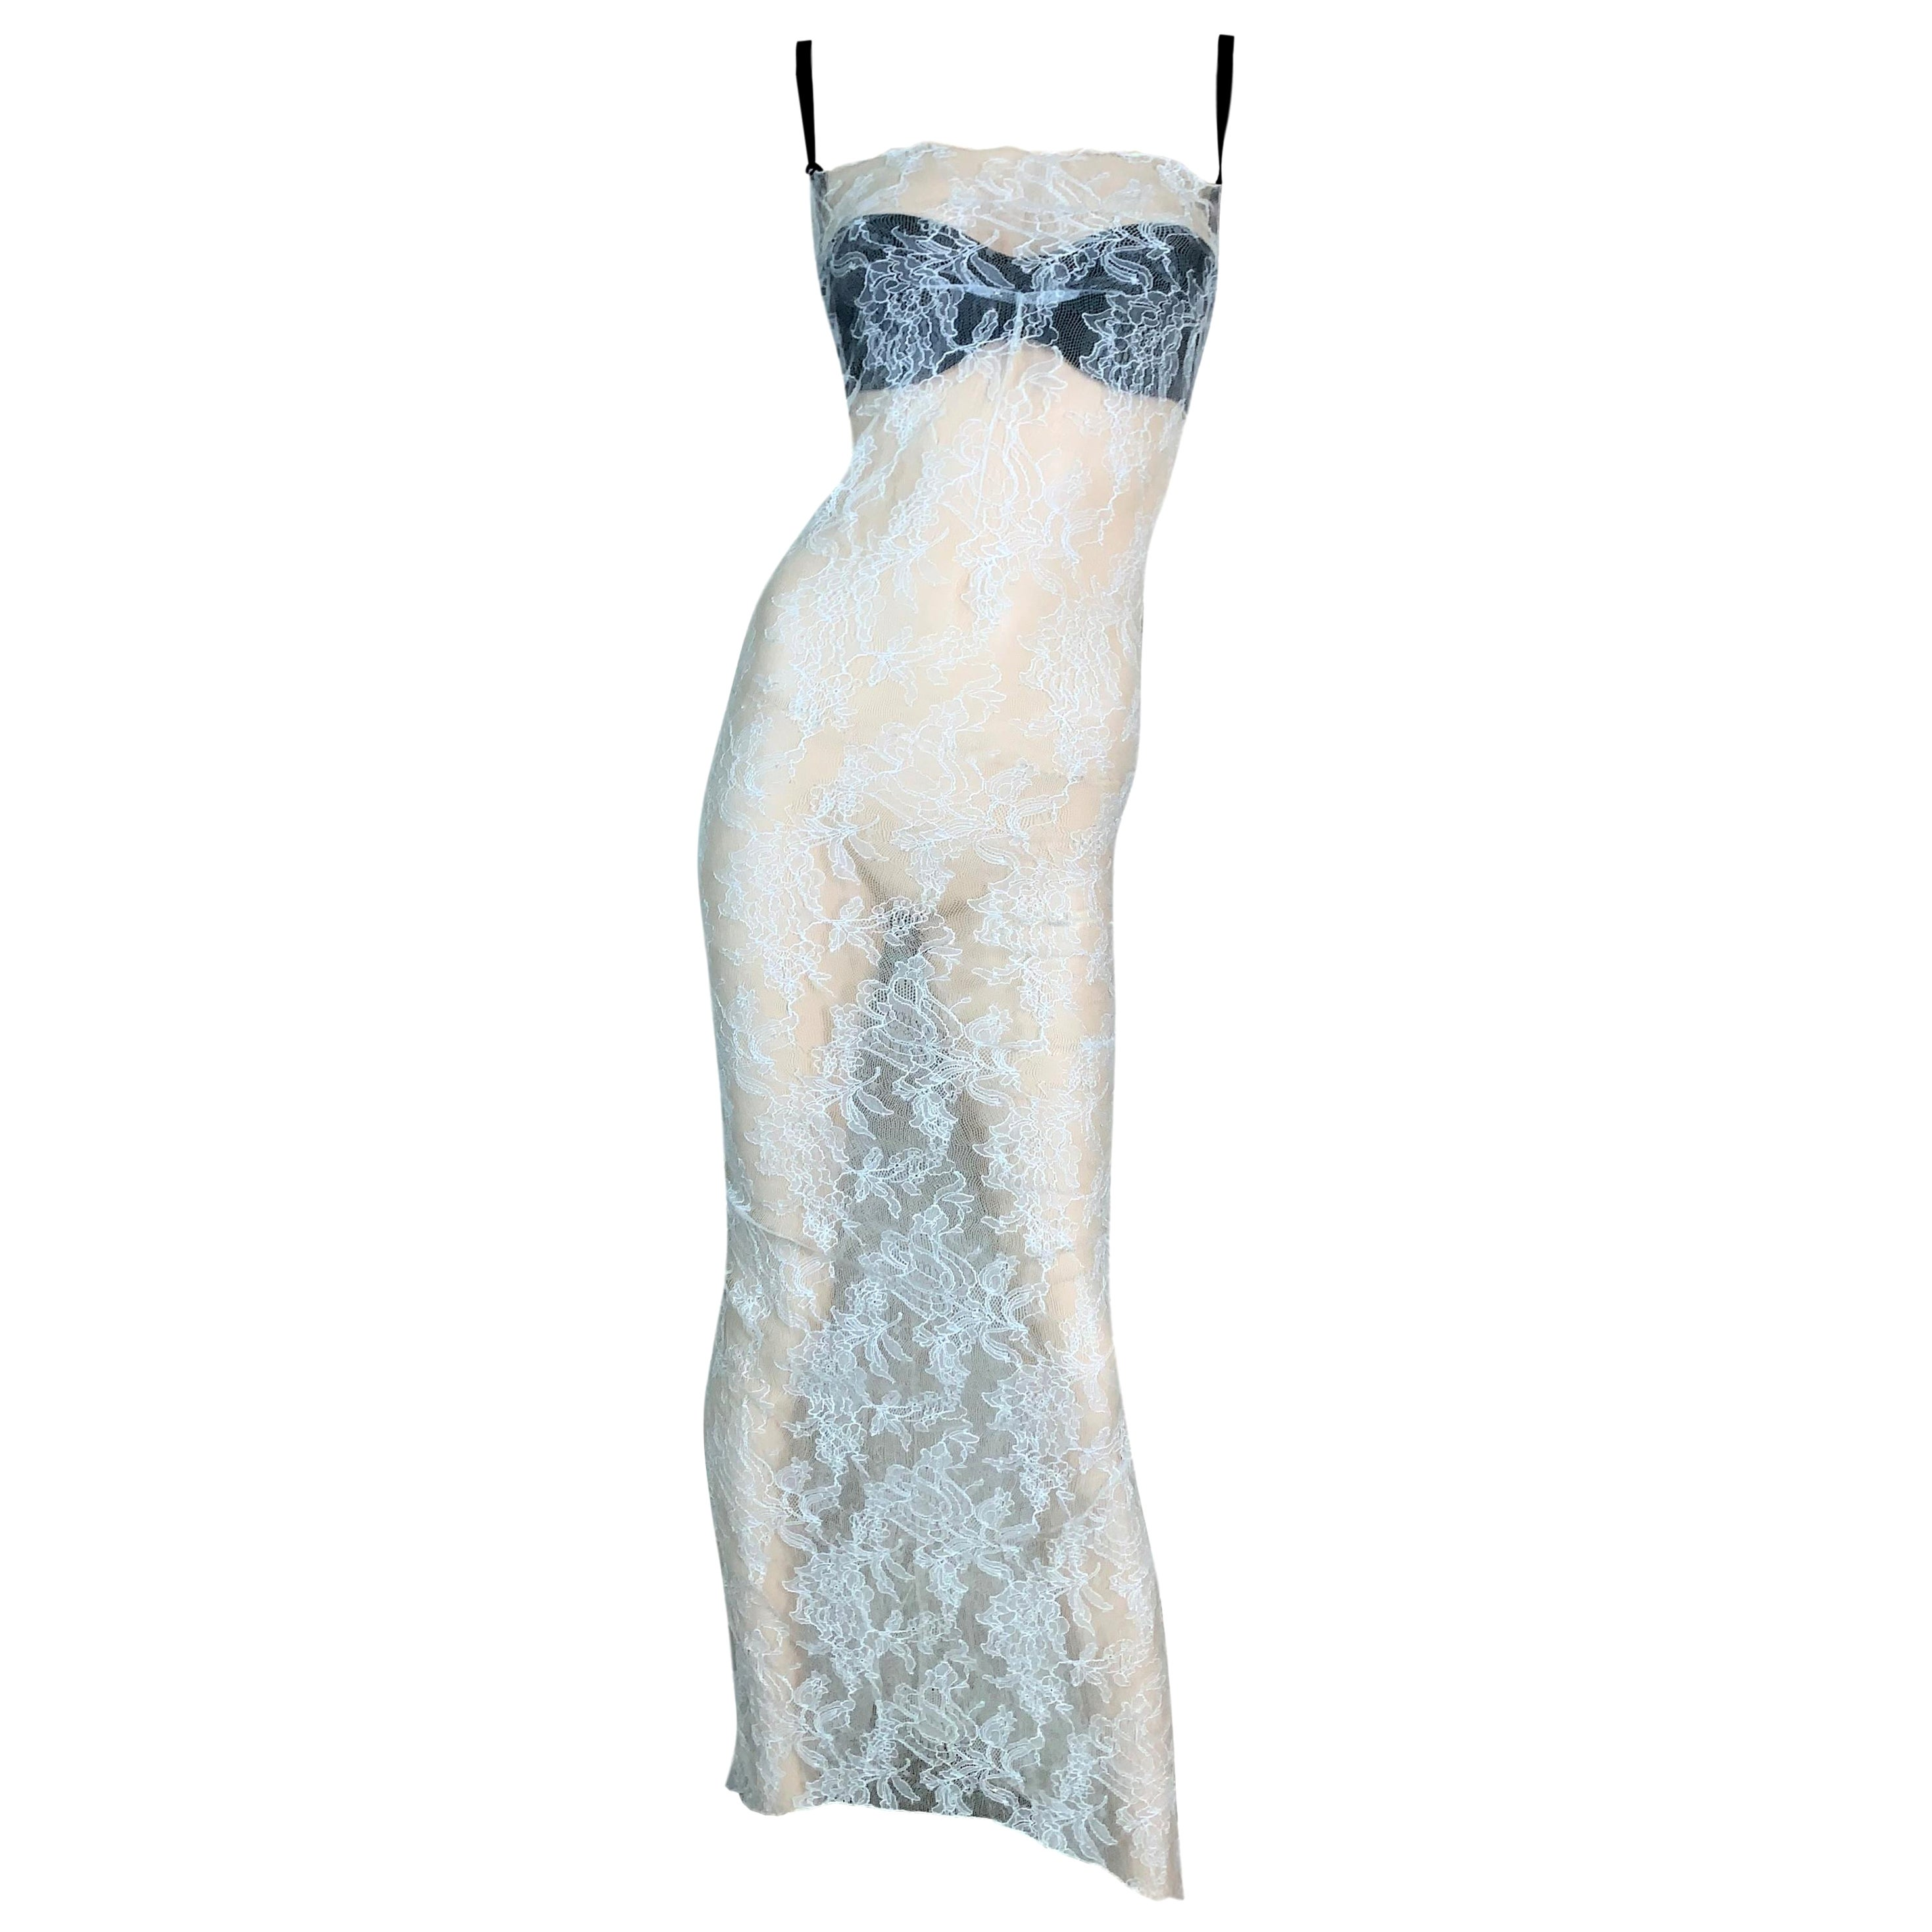 1997 Dolce & Gabbana Sheer Ivory Lace Gown Dress w Black Bra & Train